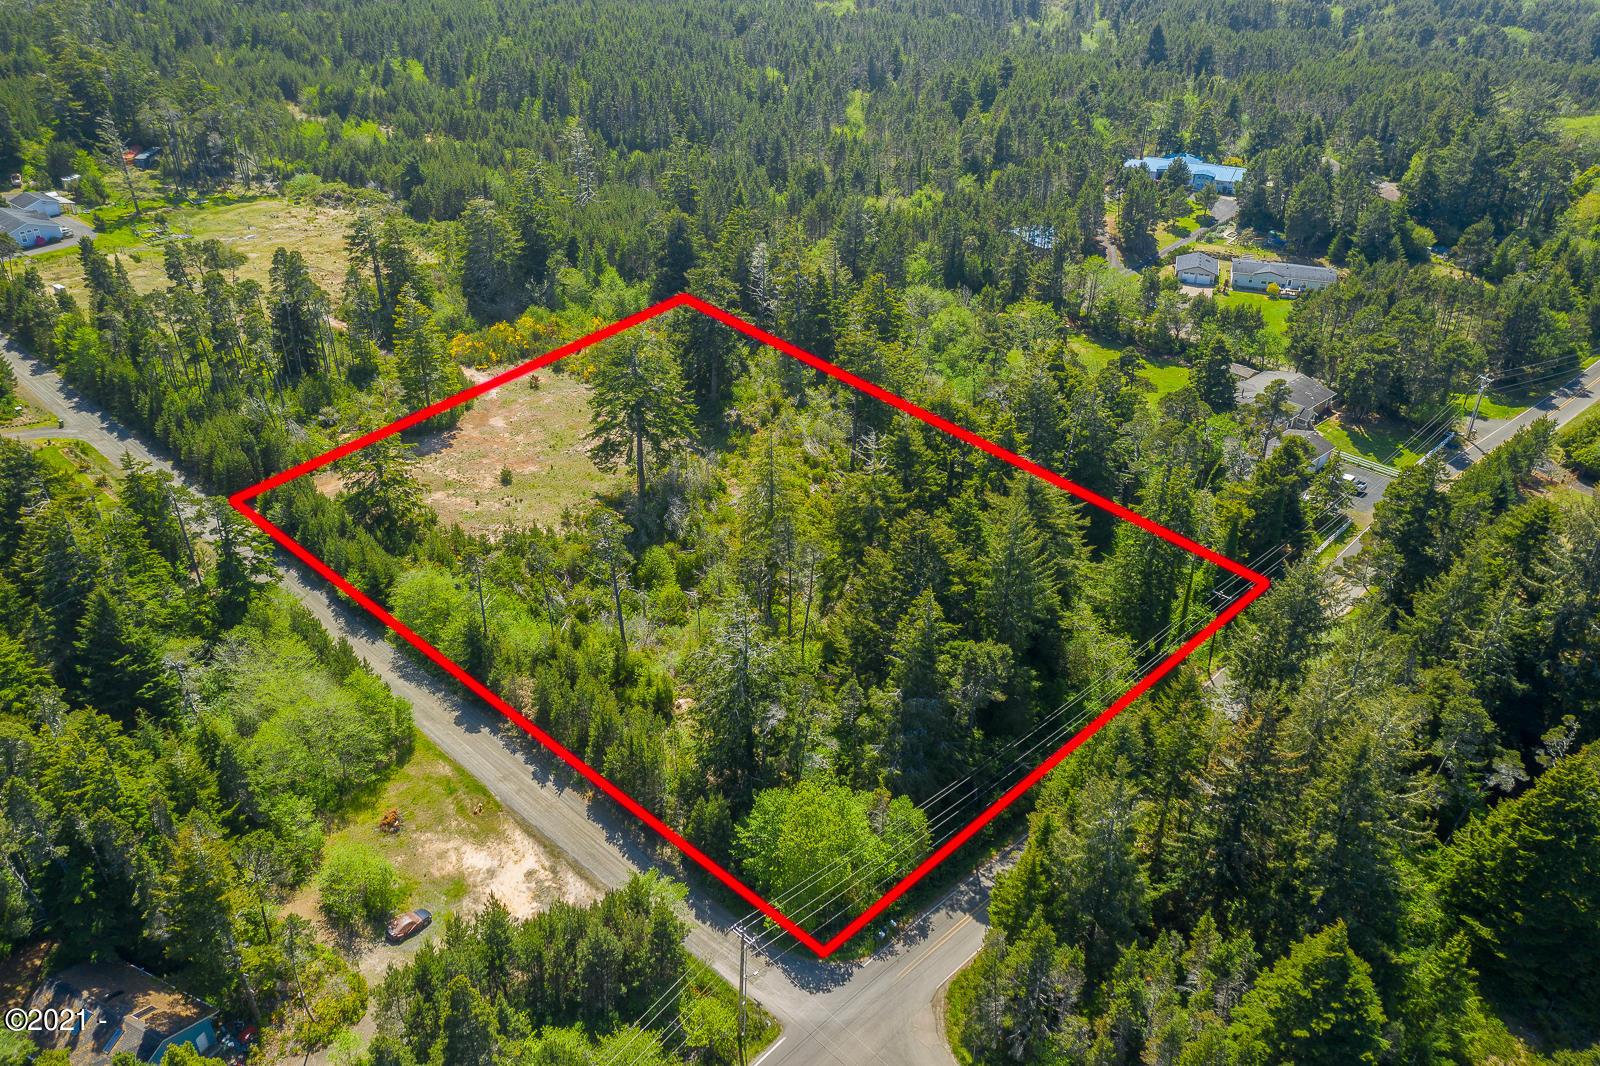 701 Kimberley Street, Seal Rock, OR 97376 - Aerial of Lot